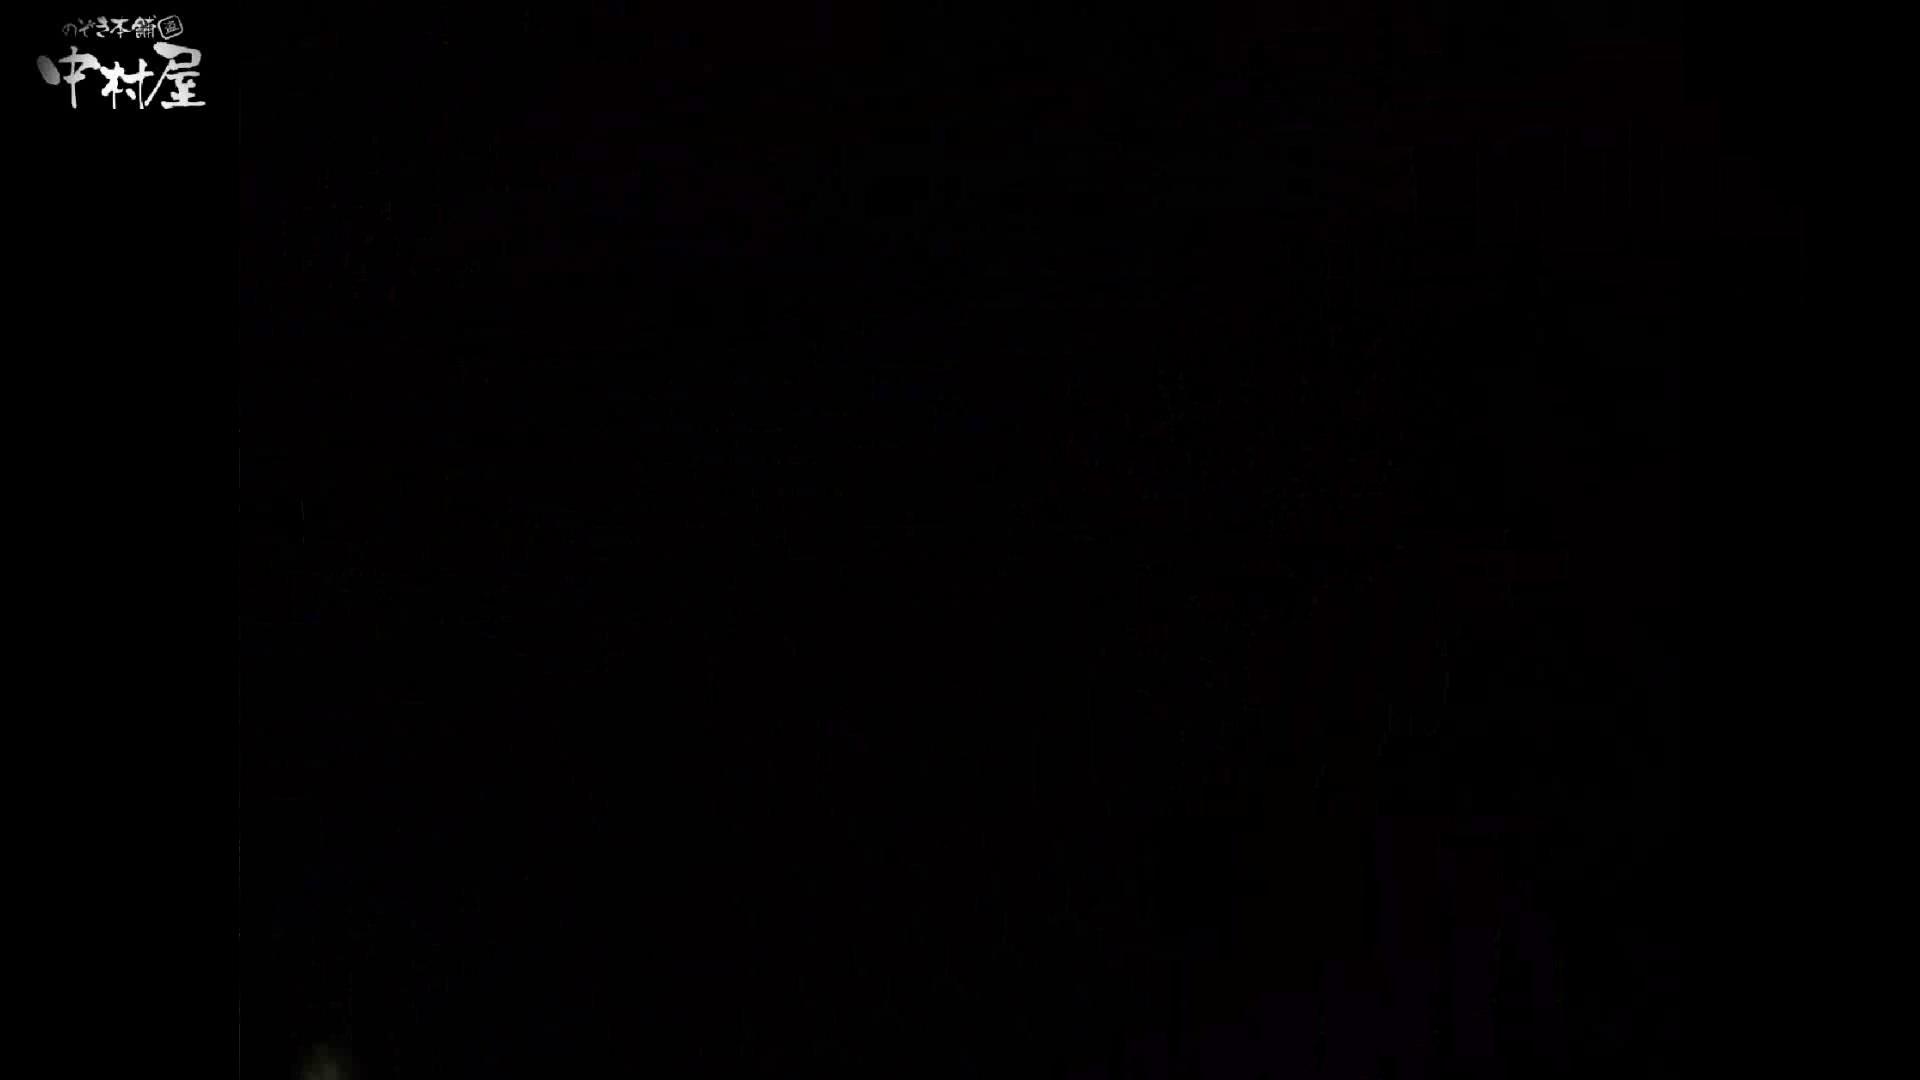 民家風呂専門盗撮師の超危険映像 vol.018 美少女のエロ生活  97連発 6